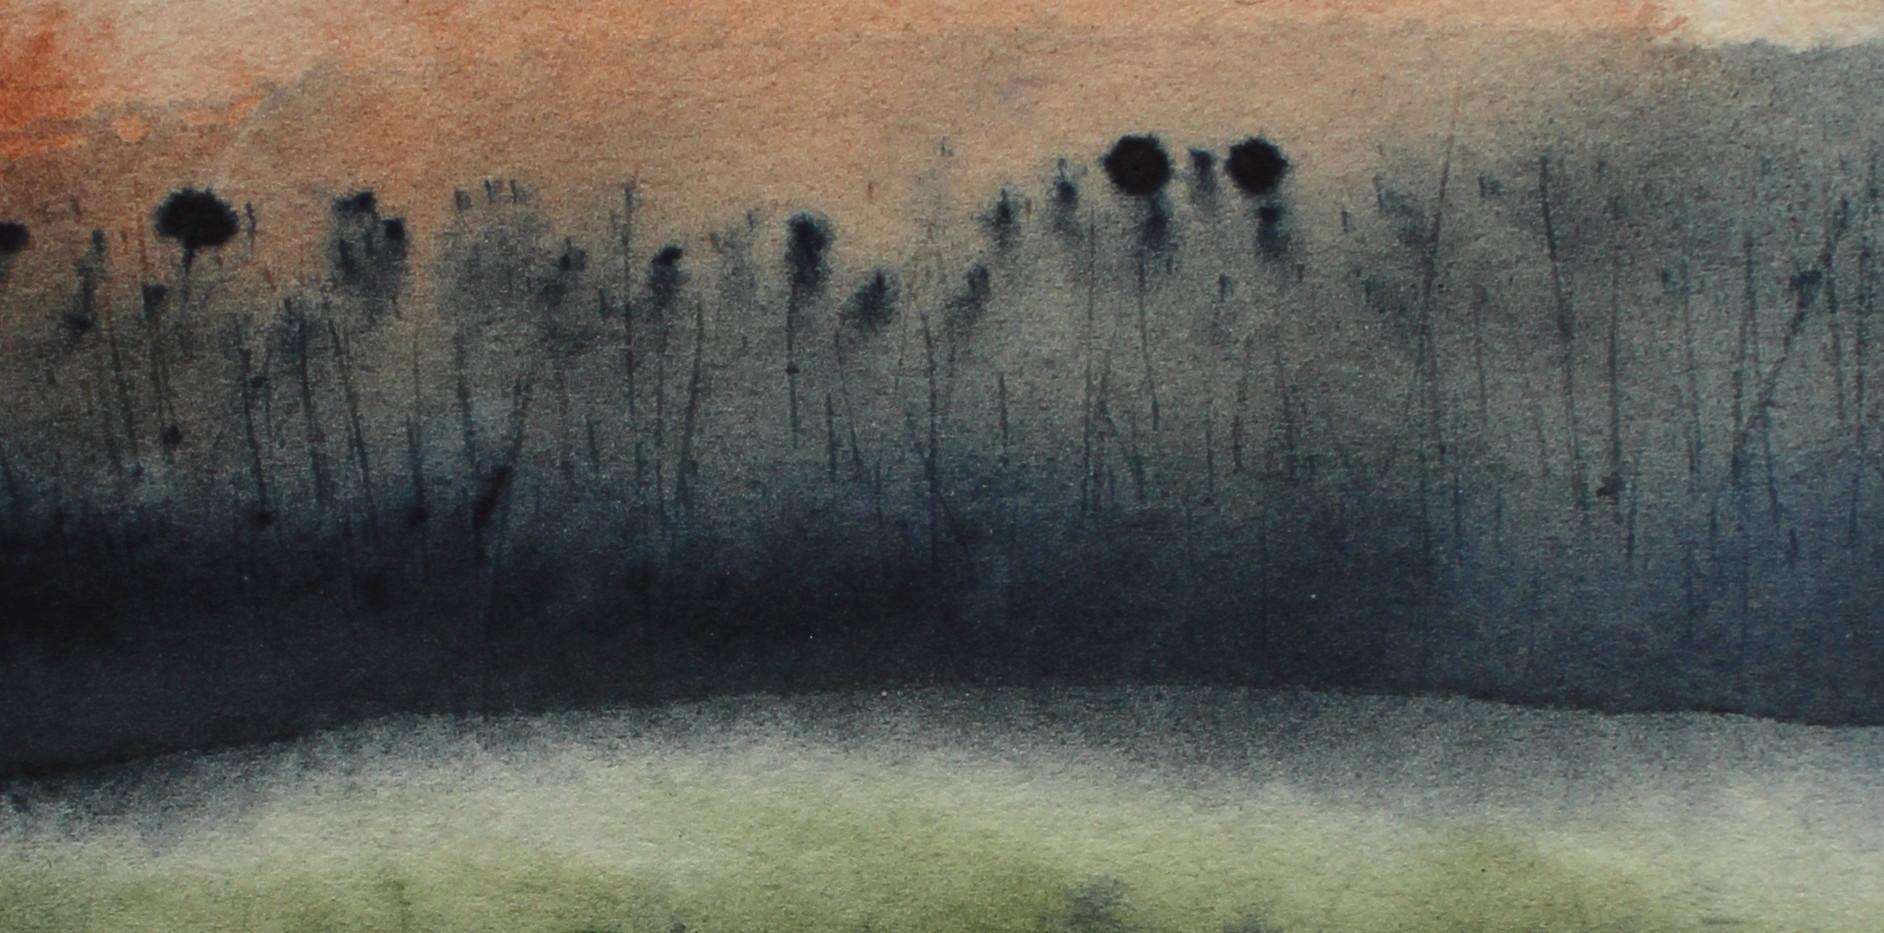 Teasels in Morning, Strangford, Jude Fenton